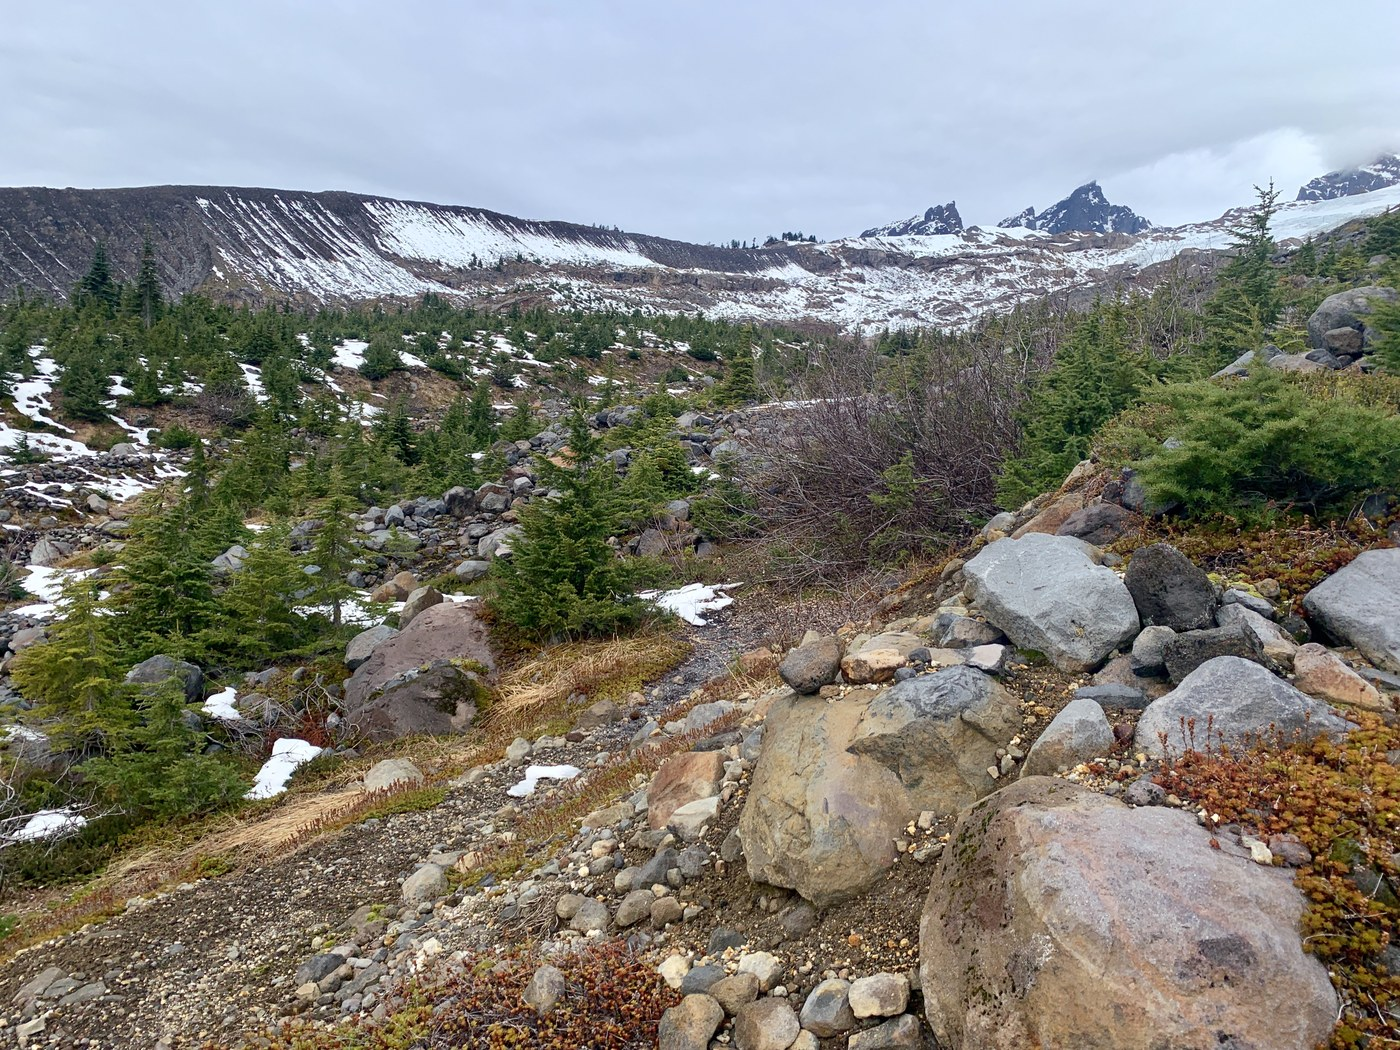 Scott Paul Trail. Photo by calixtomoon.